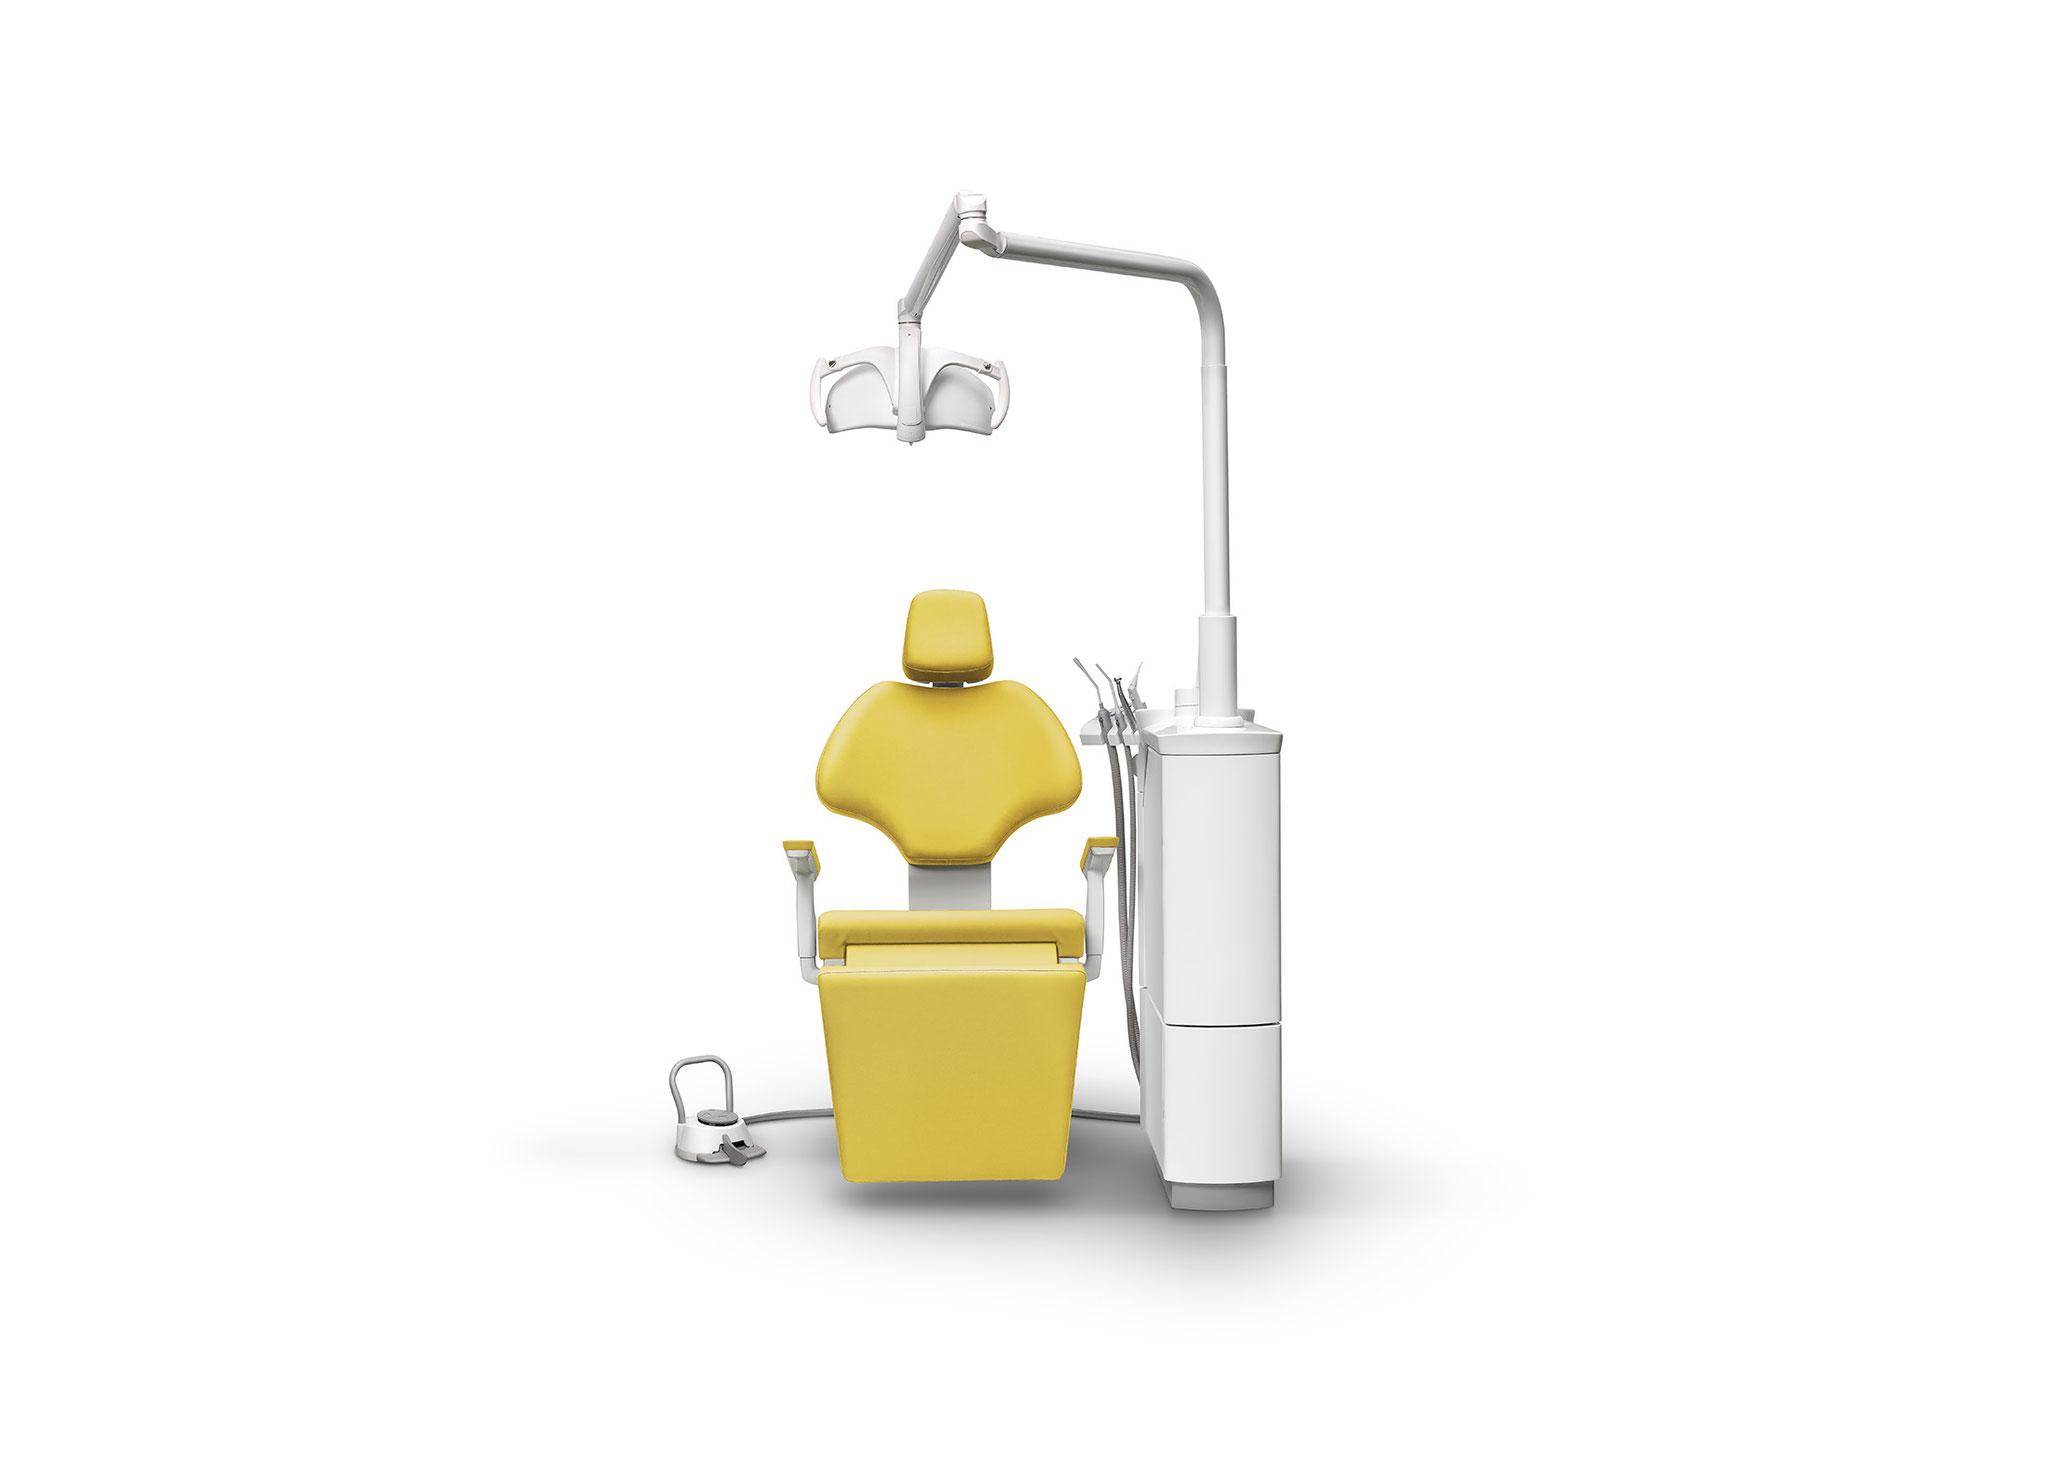 SD-710 Patientenstuhl S7 + SD-60 (Prophylaxe/ KFO-Einheit)